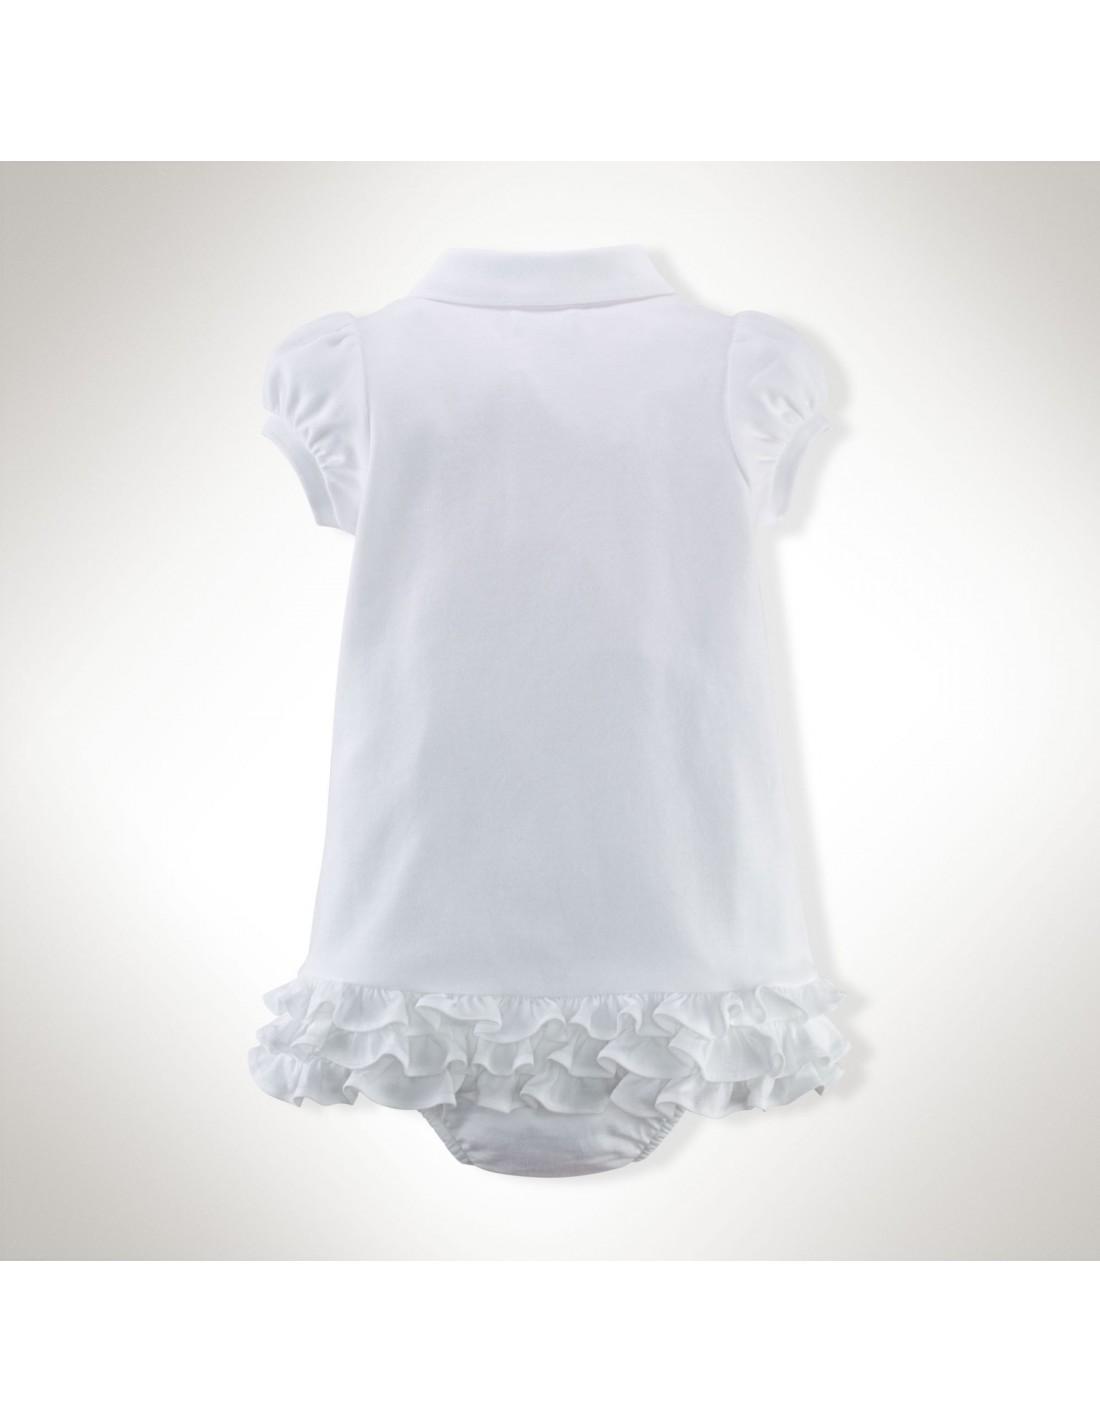 Vestido Ralph Lauren tipo polo en color blanco 972235a20ac